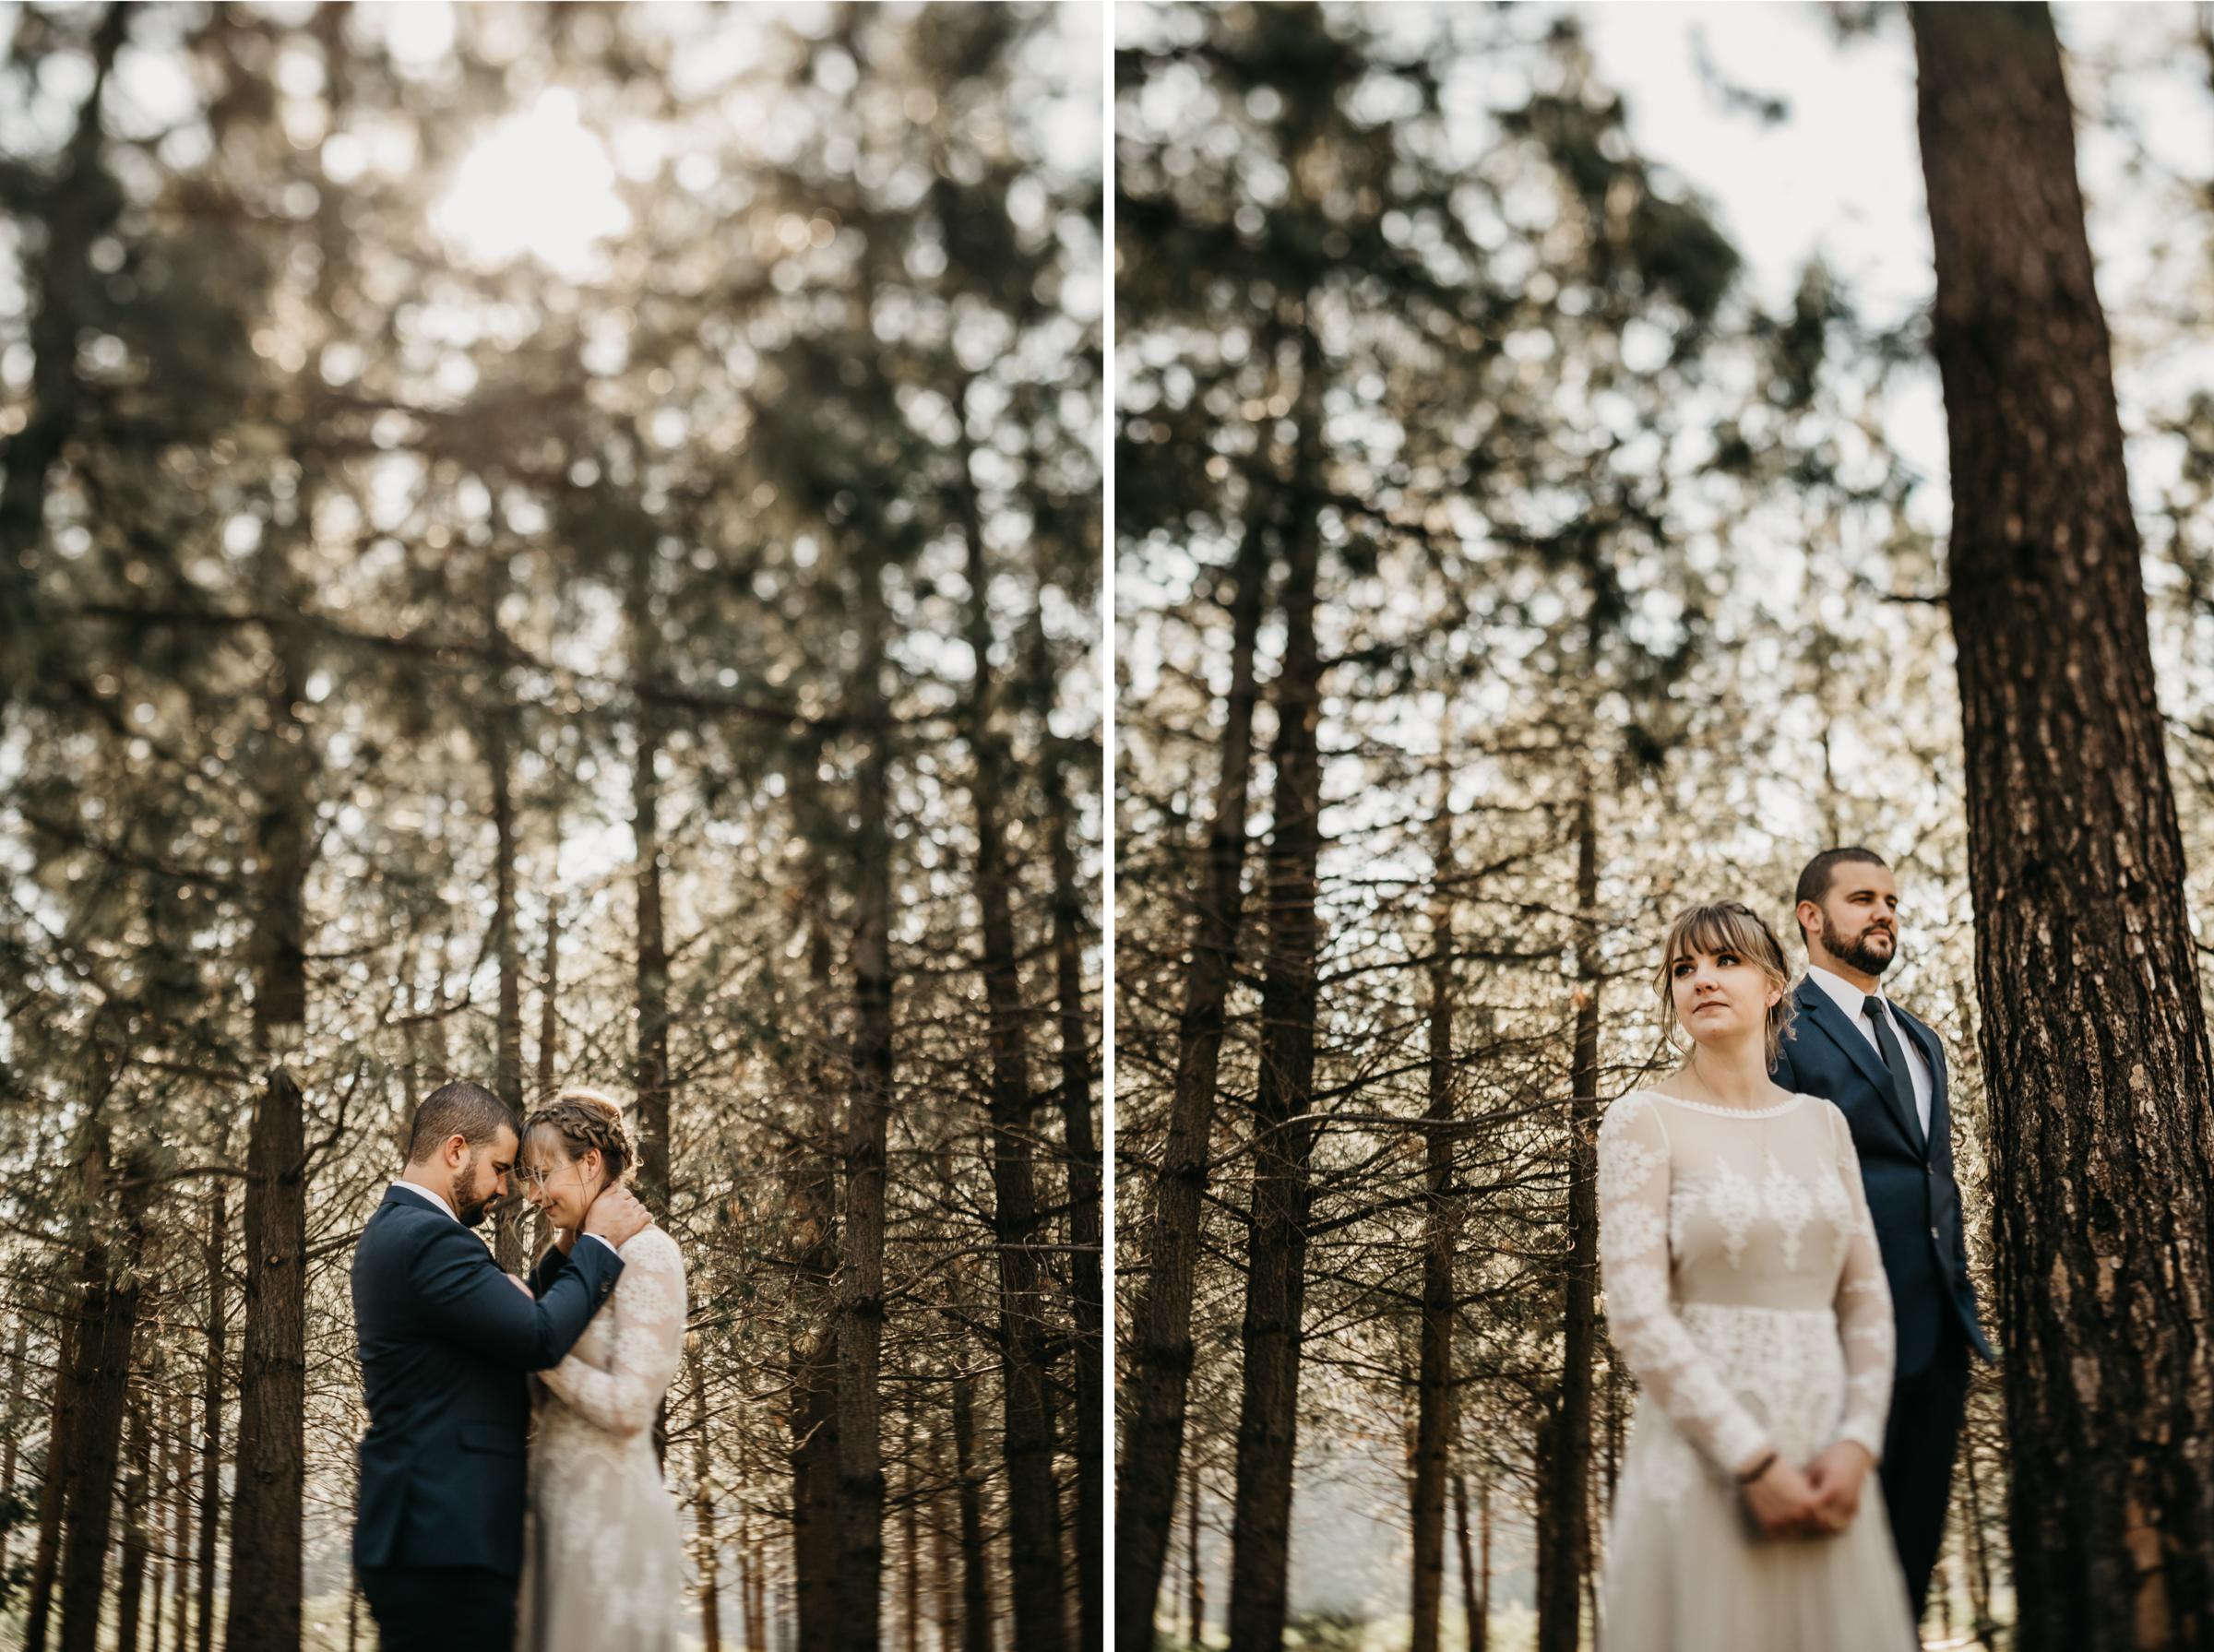 ©Isaiah + Taylor Photography - Los Angeles Wedding Photographers - Los Angeles Forest Wedding -13.jpg